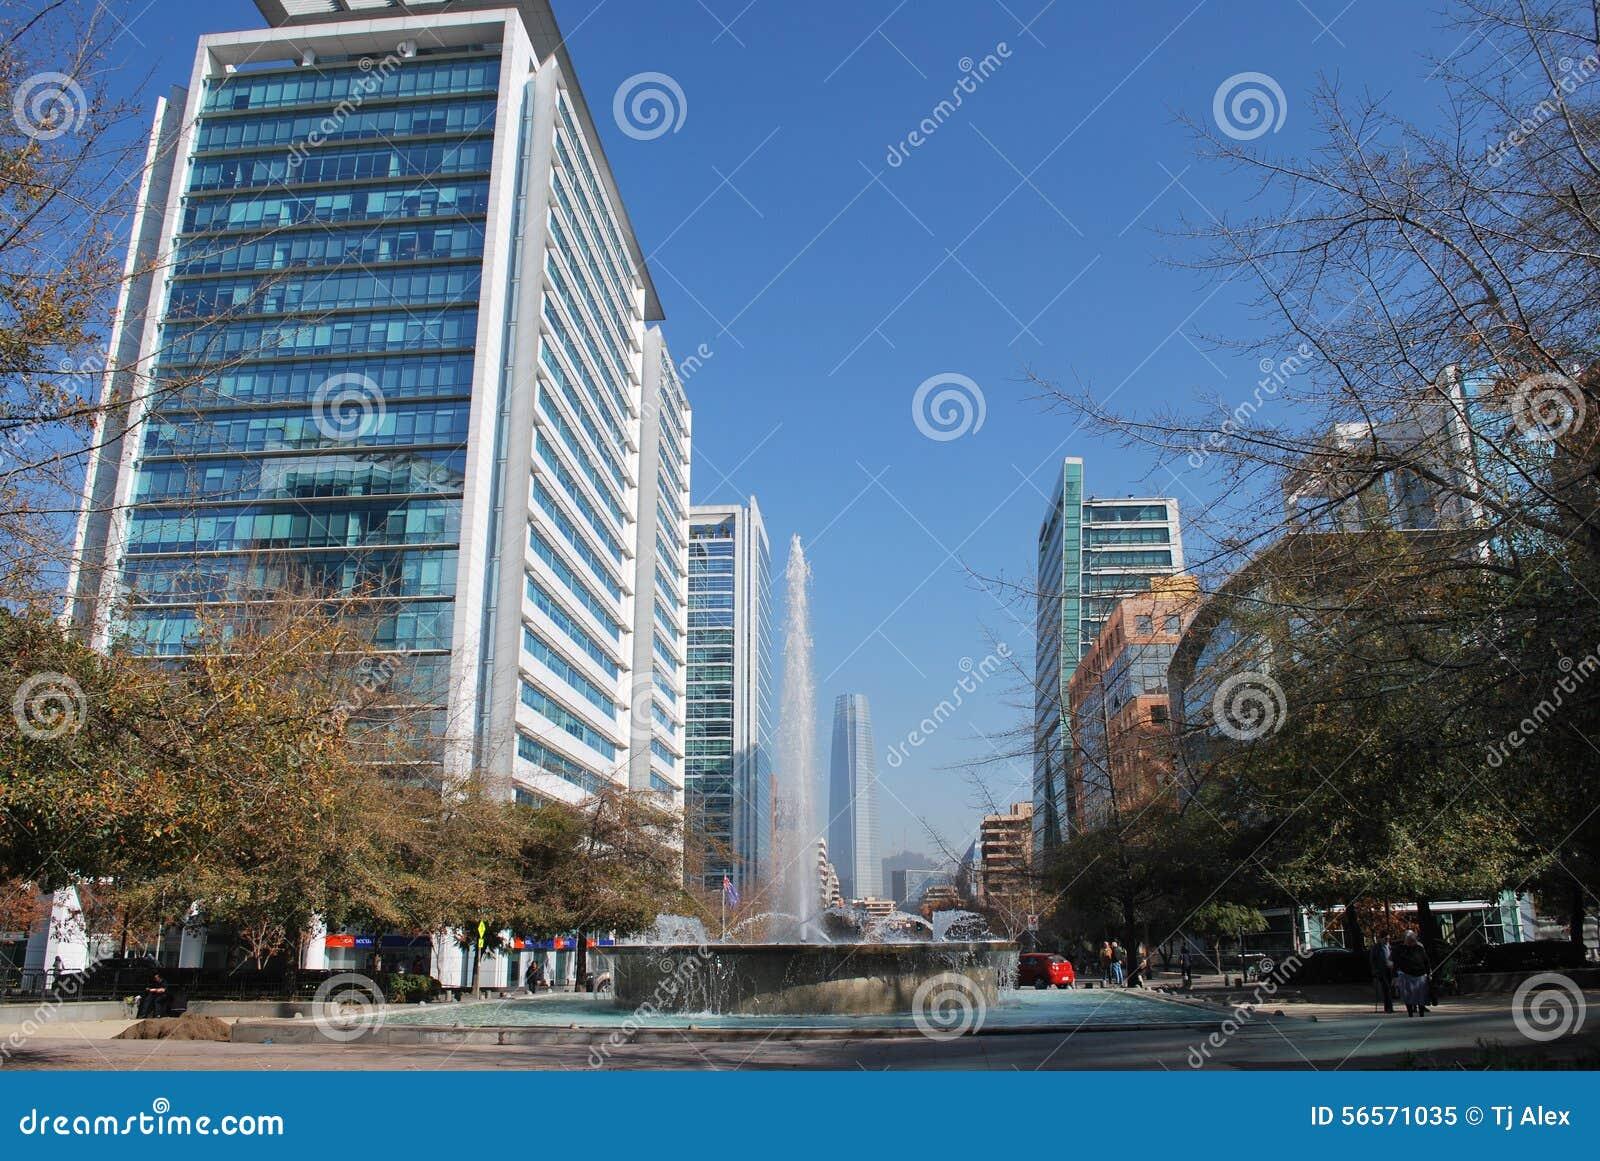 Download Πόλη του Σαντιάγο στη Χιλή στοκ εικόνα. εικόνα από σπίτια - 56571035